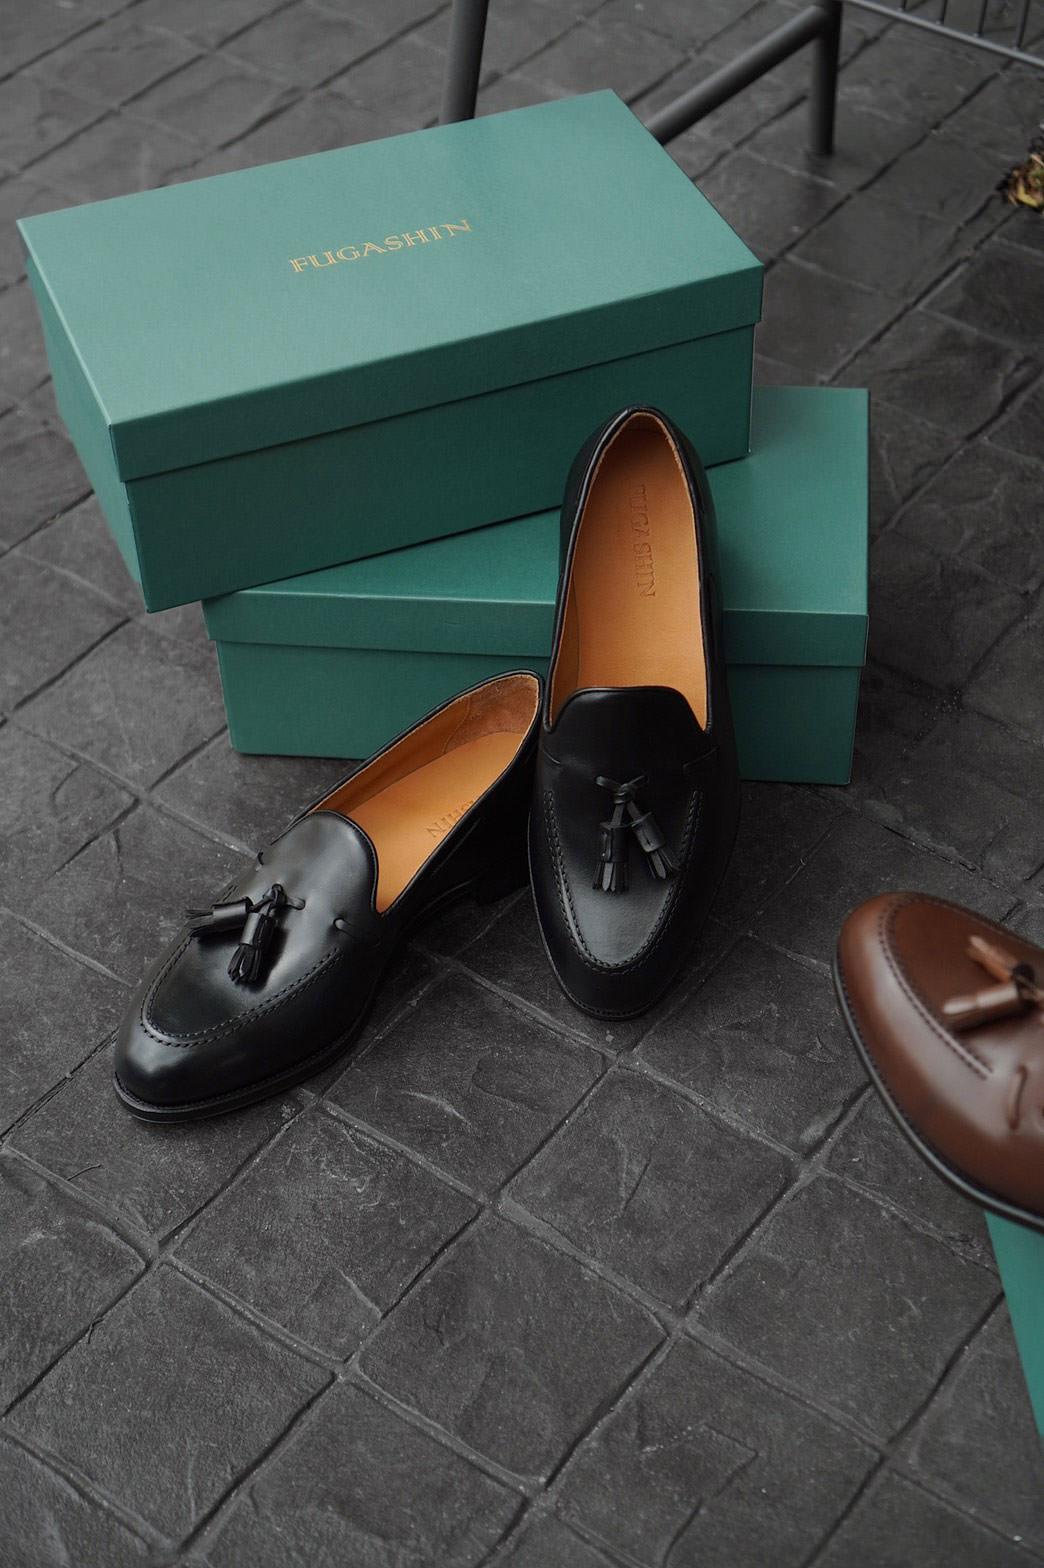 Fugashin New Last Tassel Loafers - Black